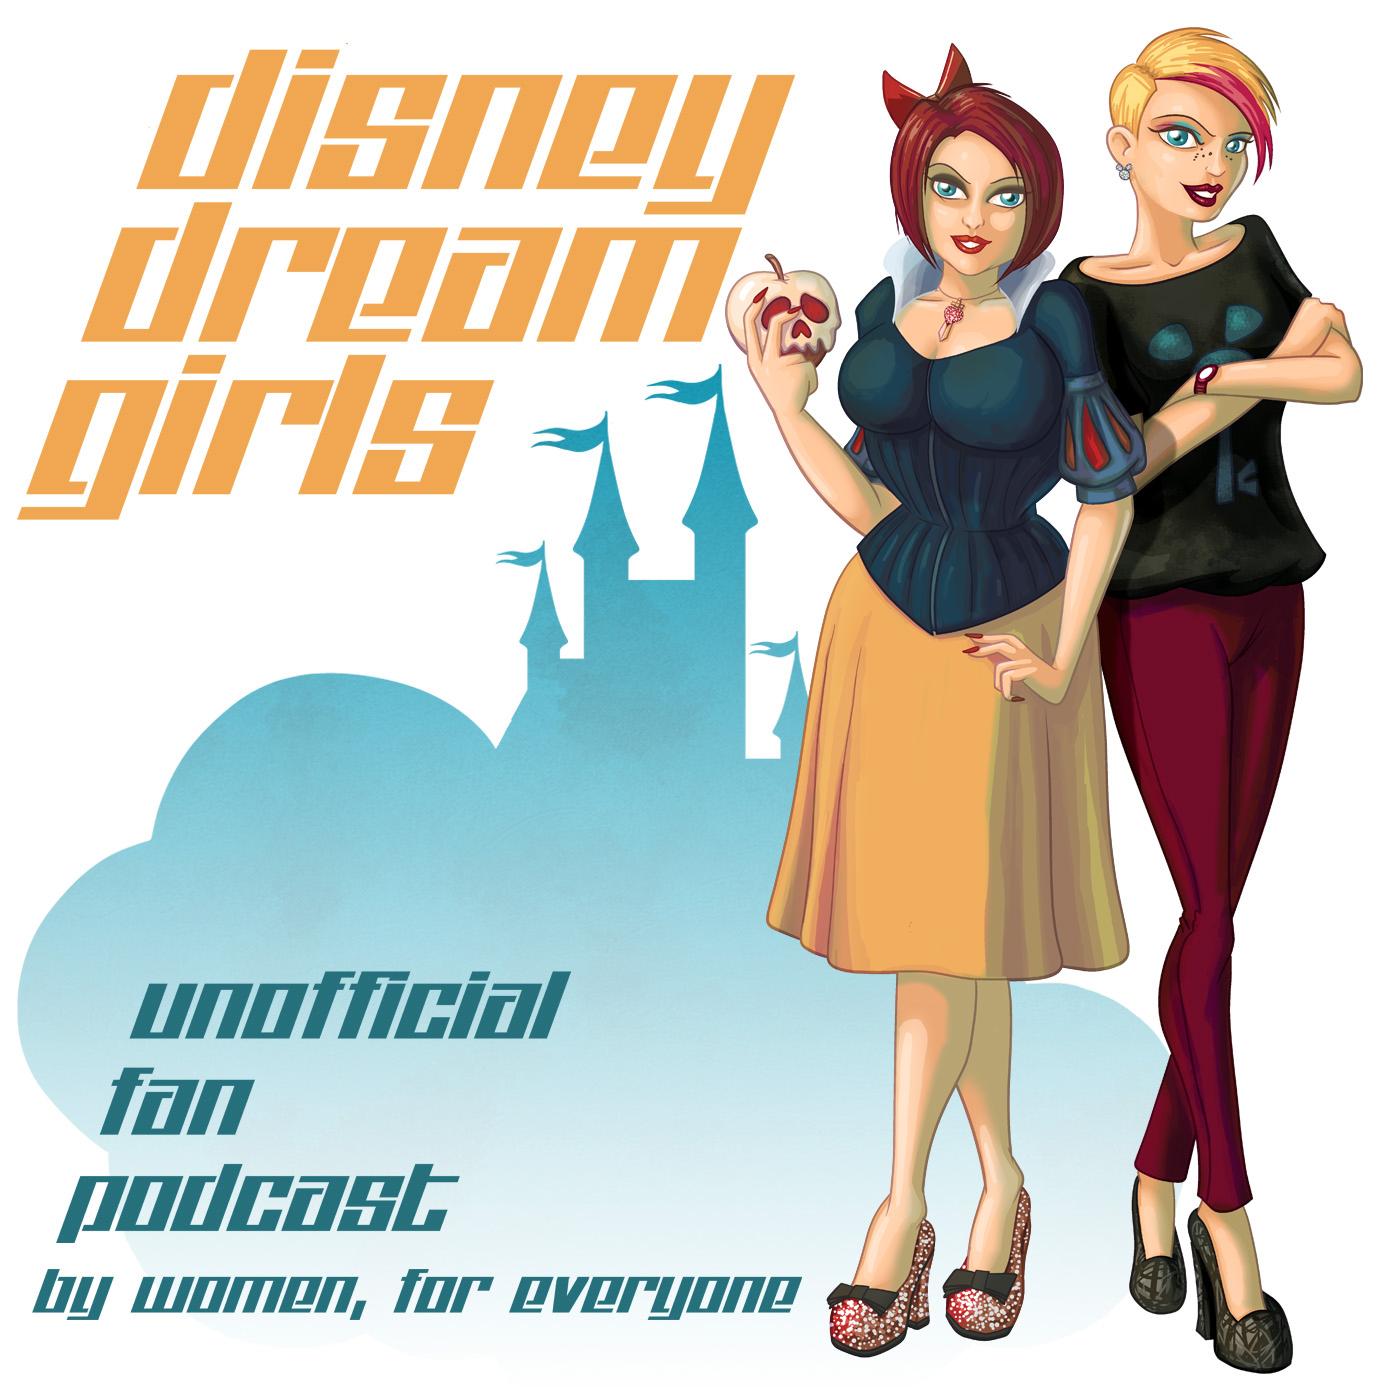 365 - The Disney Dream Girls Podcast show art